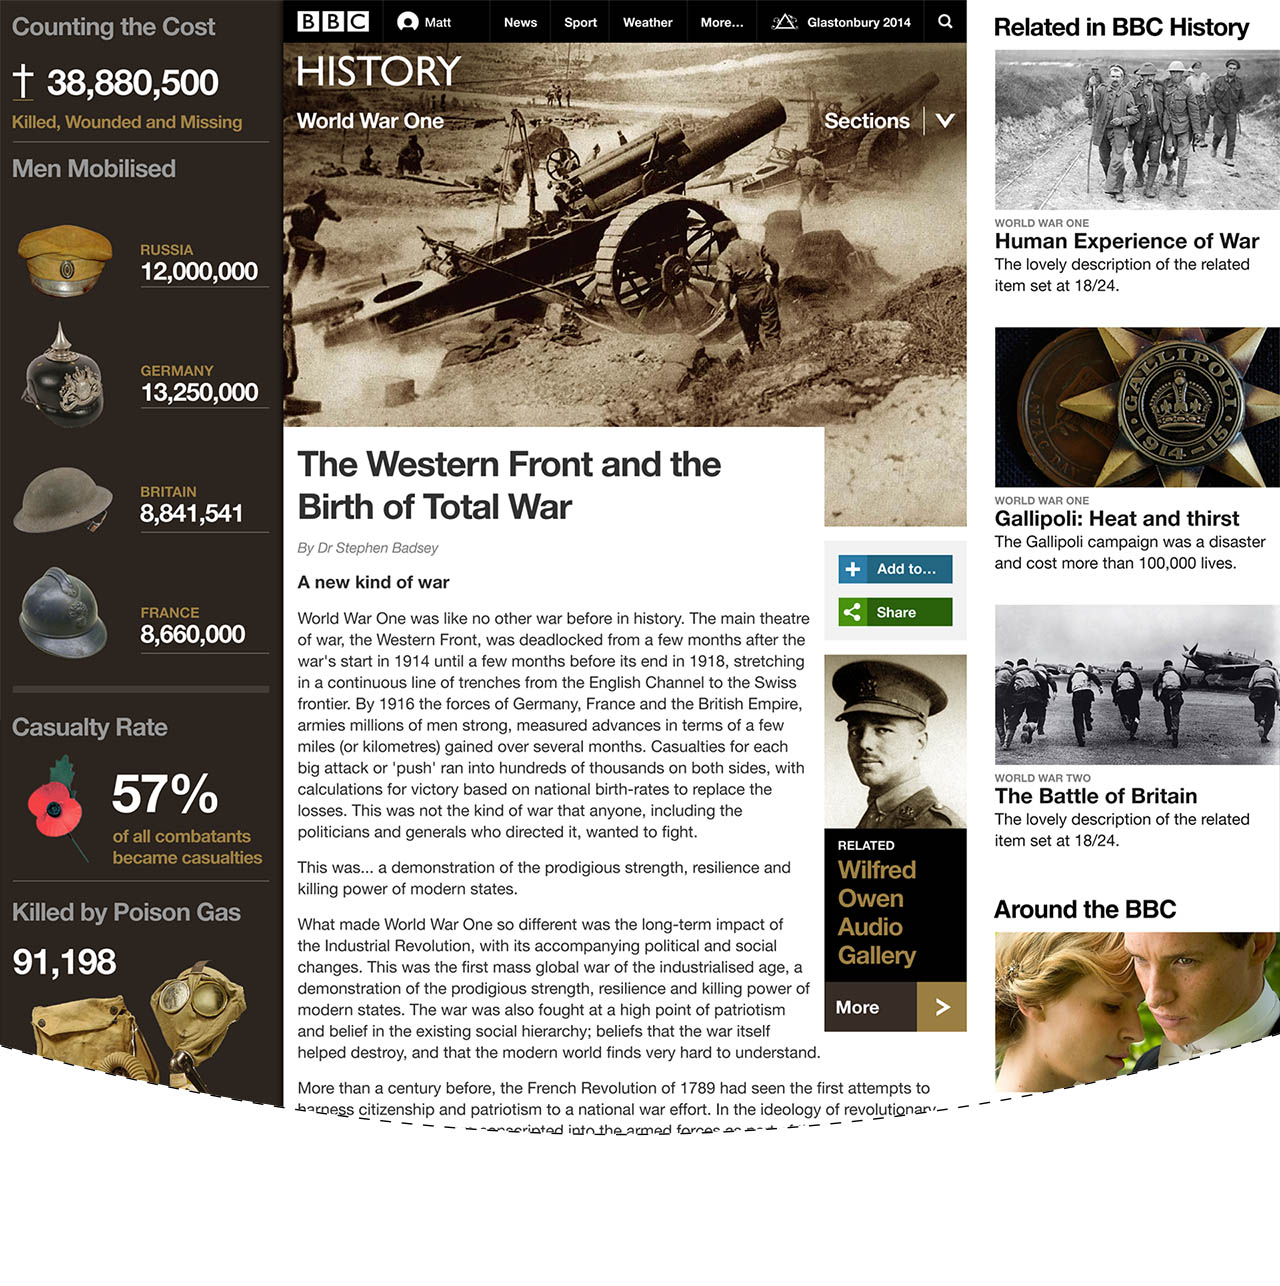 bbc history page